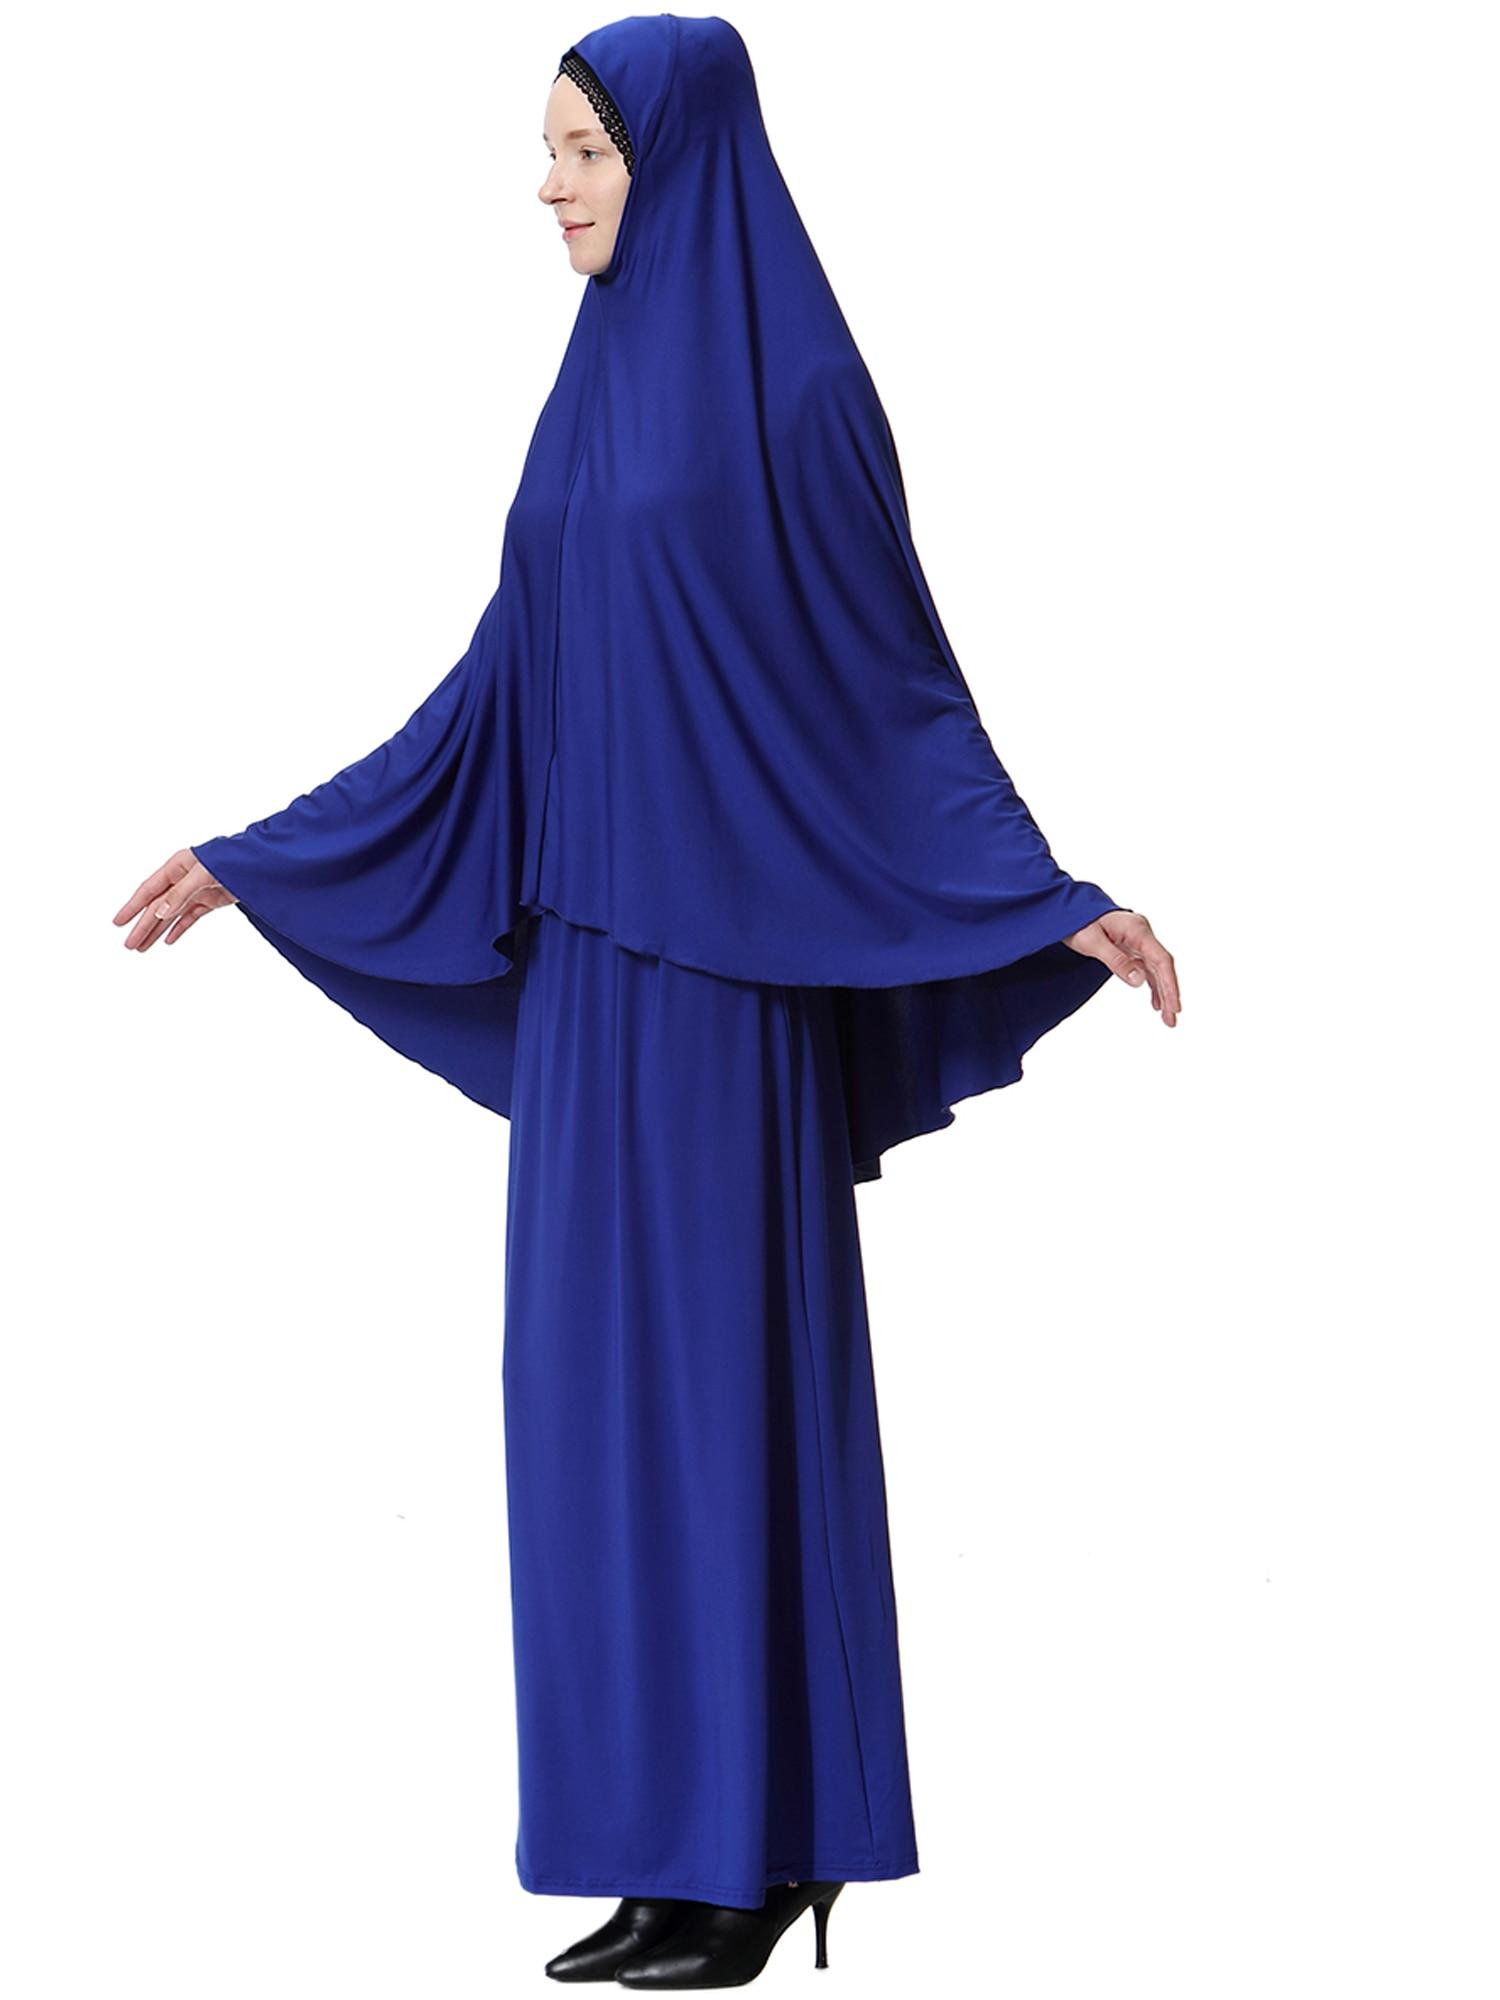 Islamic Prayer Clothes Muslim Women Hijab Dress Arab Long Hijab Khimar Abaya